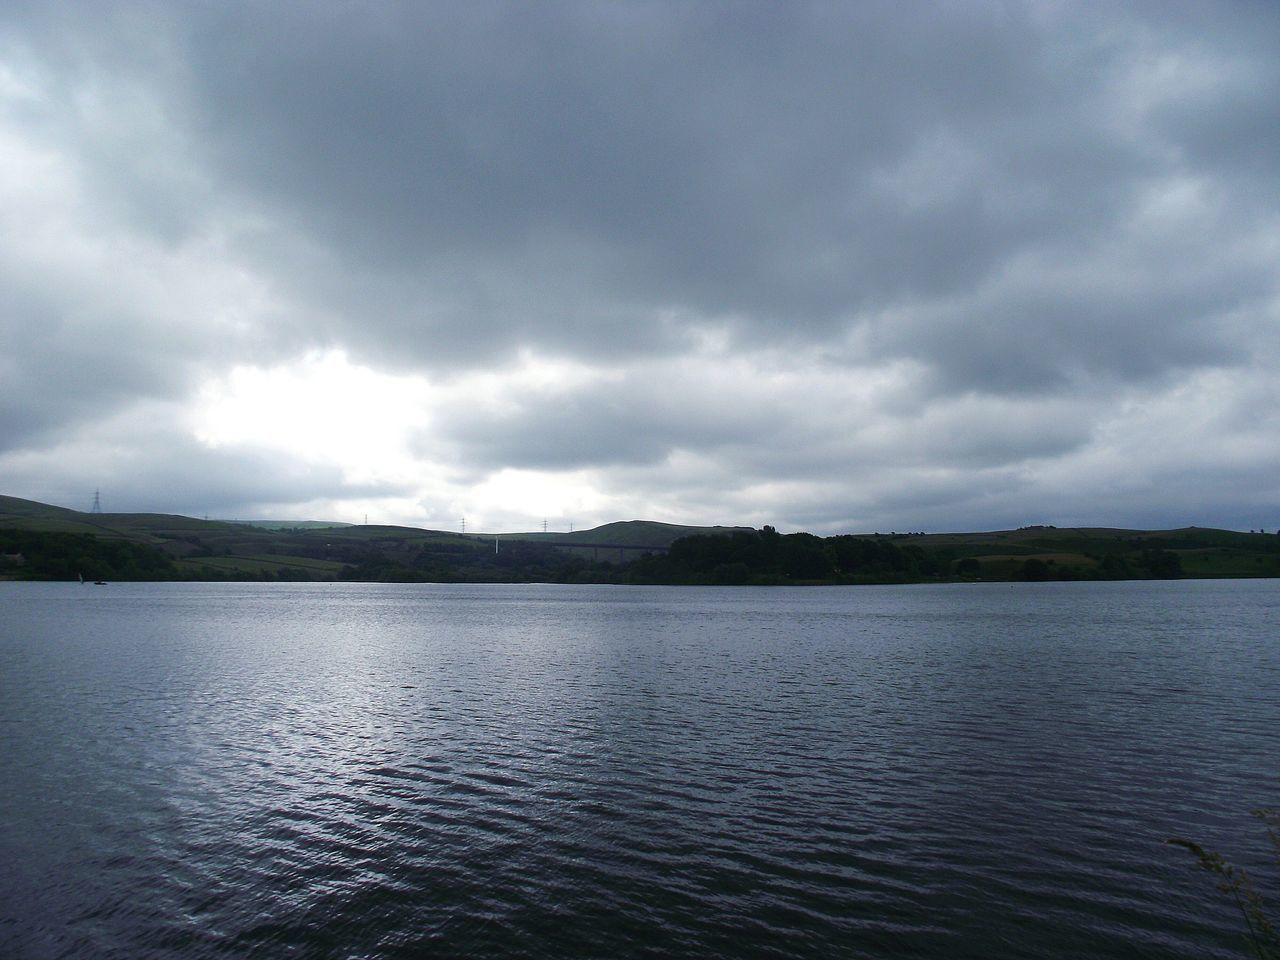 Hollingworth Lake Hollingsworth Walking Around Clouds And Sky Lake Lake View EyeEm Best Shots Femalephotographerofthemonth